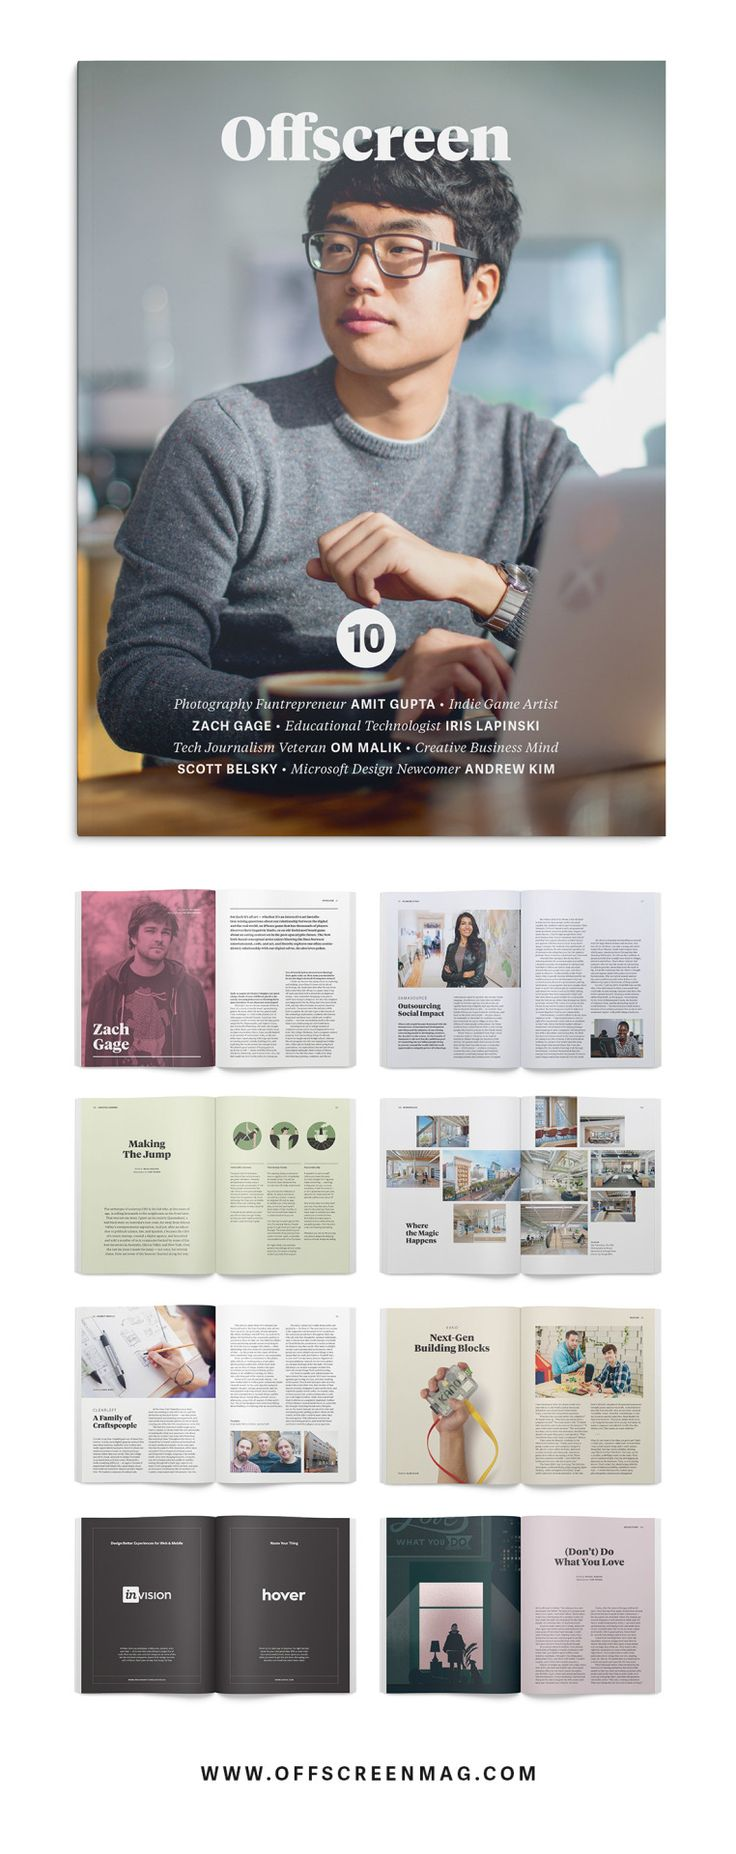 Offscreen Magazine : Photo